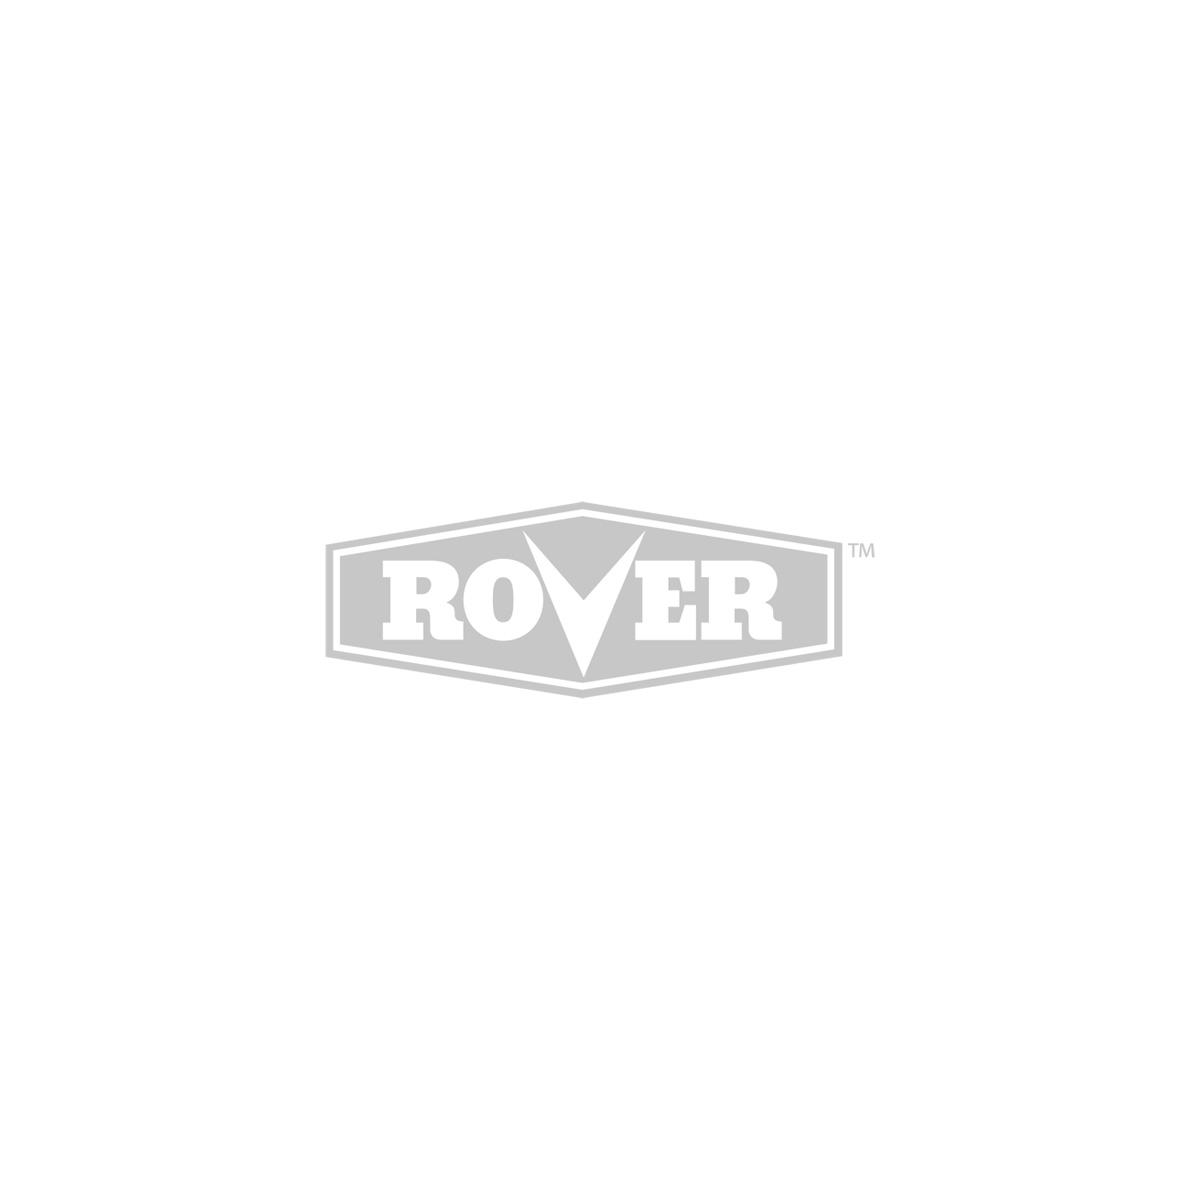 Rover Pro Cut 700 Series Blade Kit